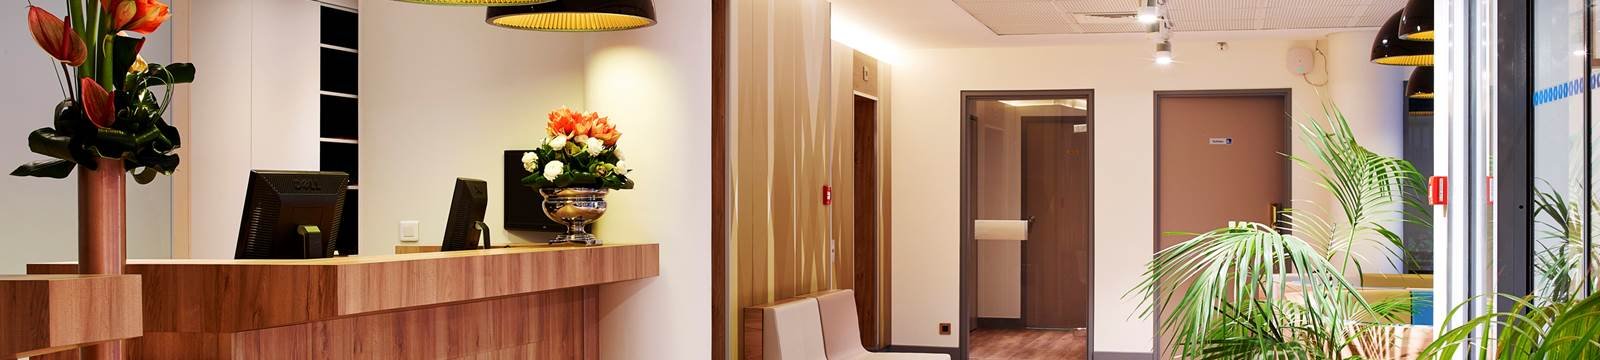 Contact median paris porte de versailles - Median hotel paris porte de versailles ...